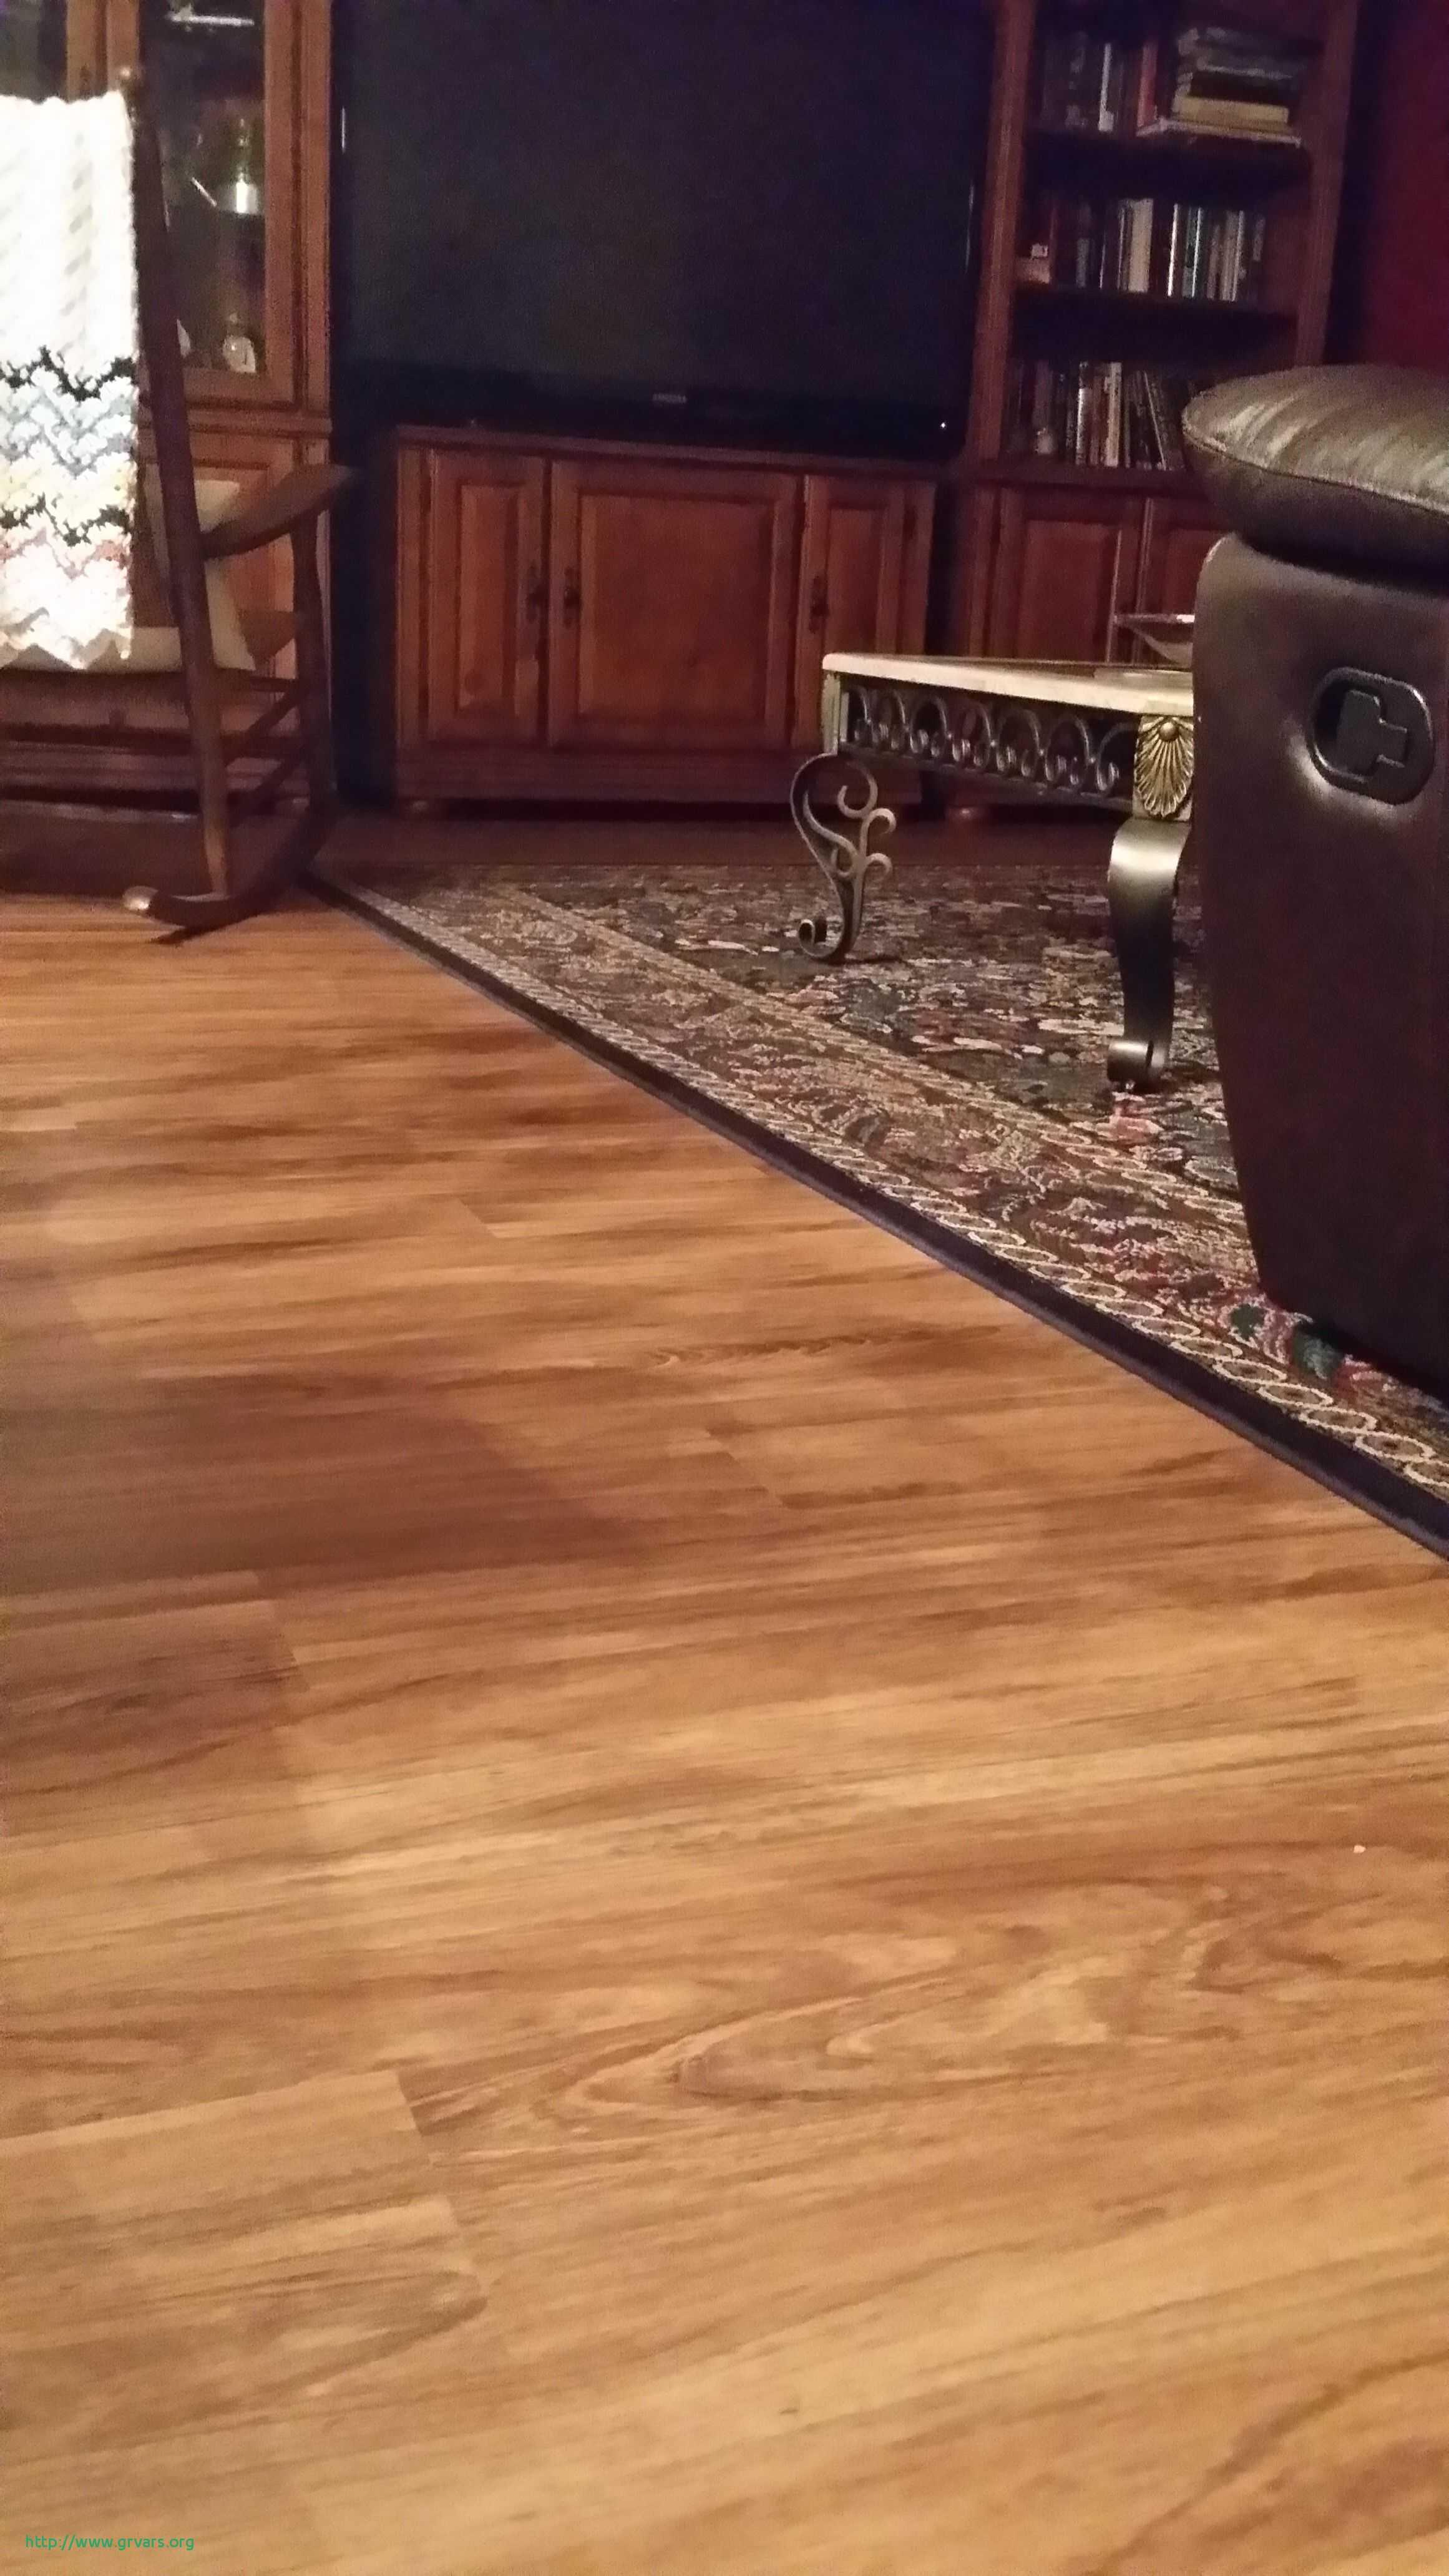 dj hardwood flooring of we ship floors meilleur de we make beautiful wood flooring and guide in we ship floors meilleur de new engineered vinyl plank flooring called classico teak from shaw